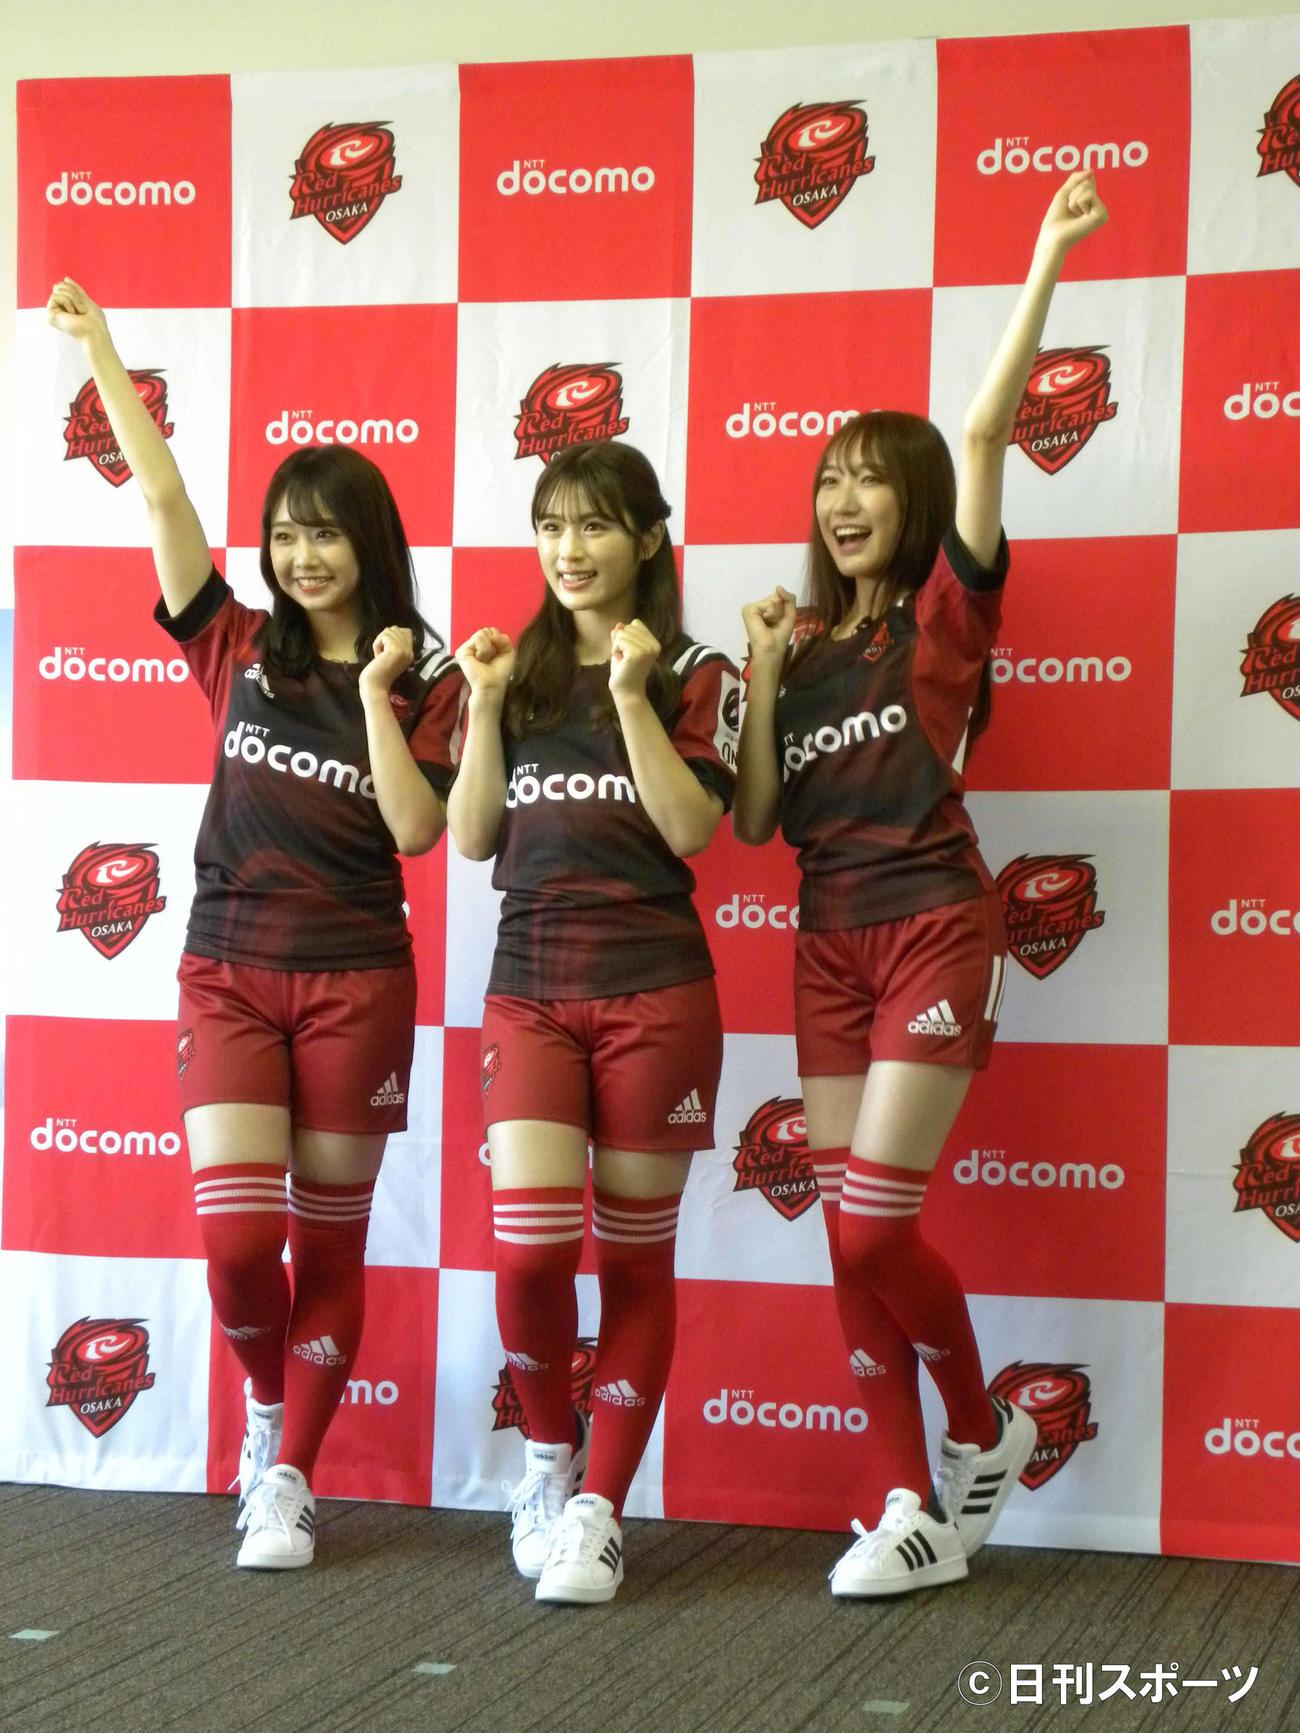 NTTドコモレッドハリケーンズ大阪の公式アンバサダーに就任したNMB48の左から加藤夕夏、渋谷凪咲、原かれん(撮影・松本航)